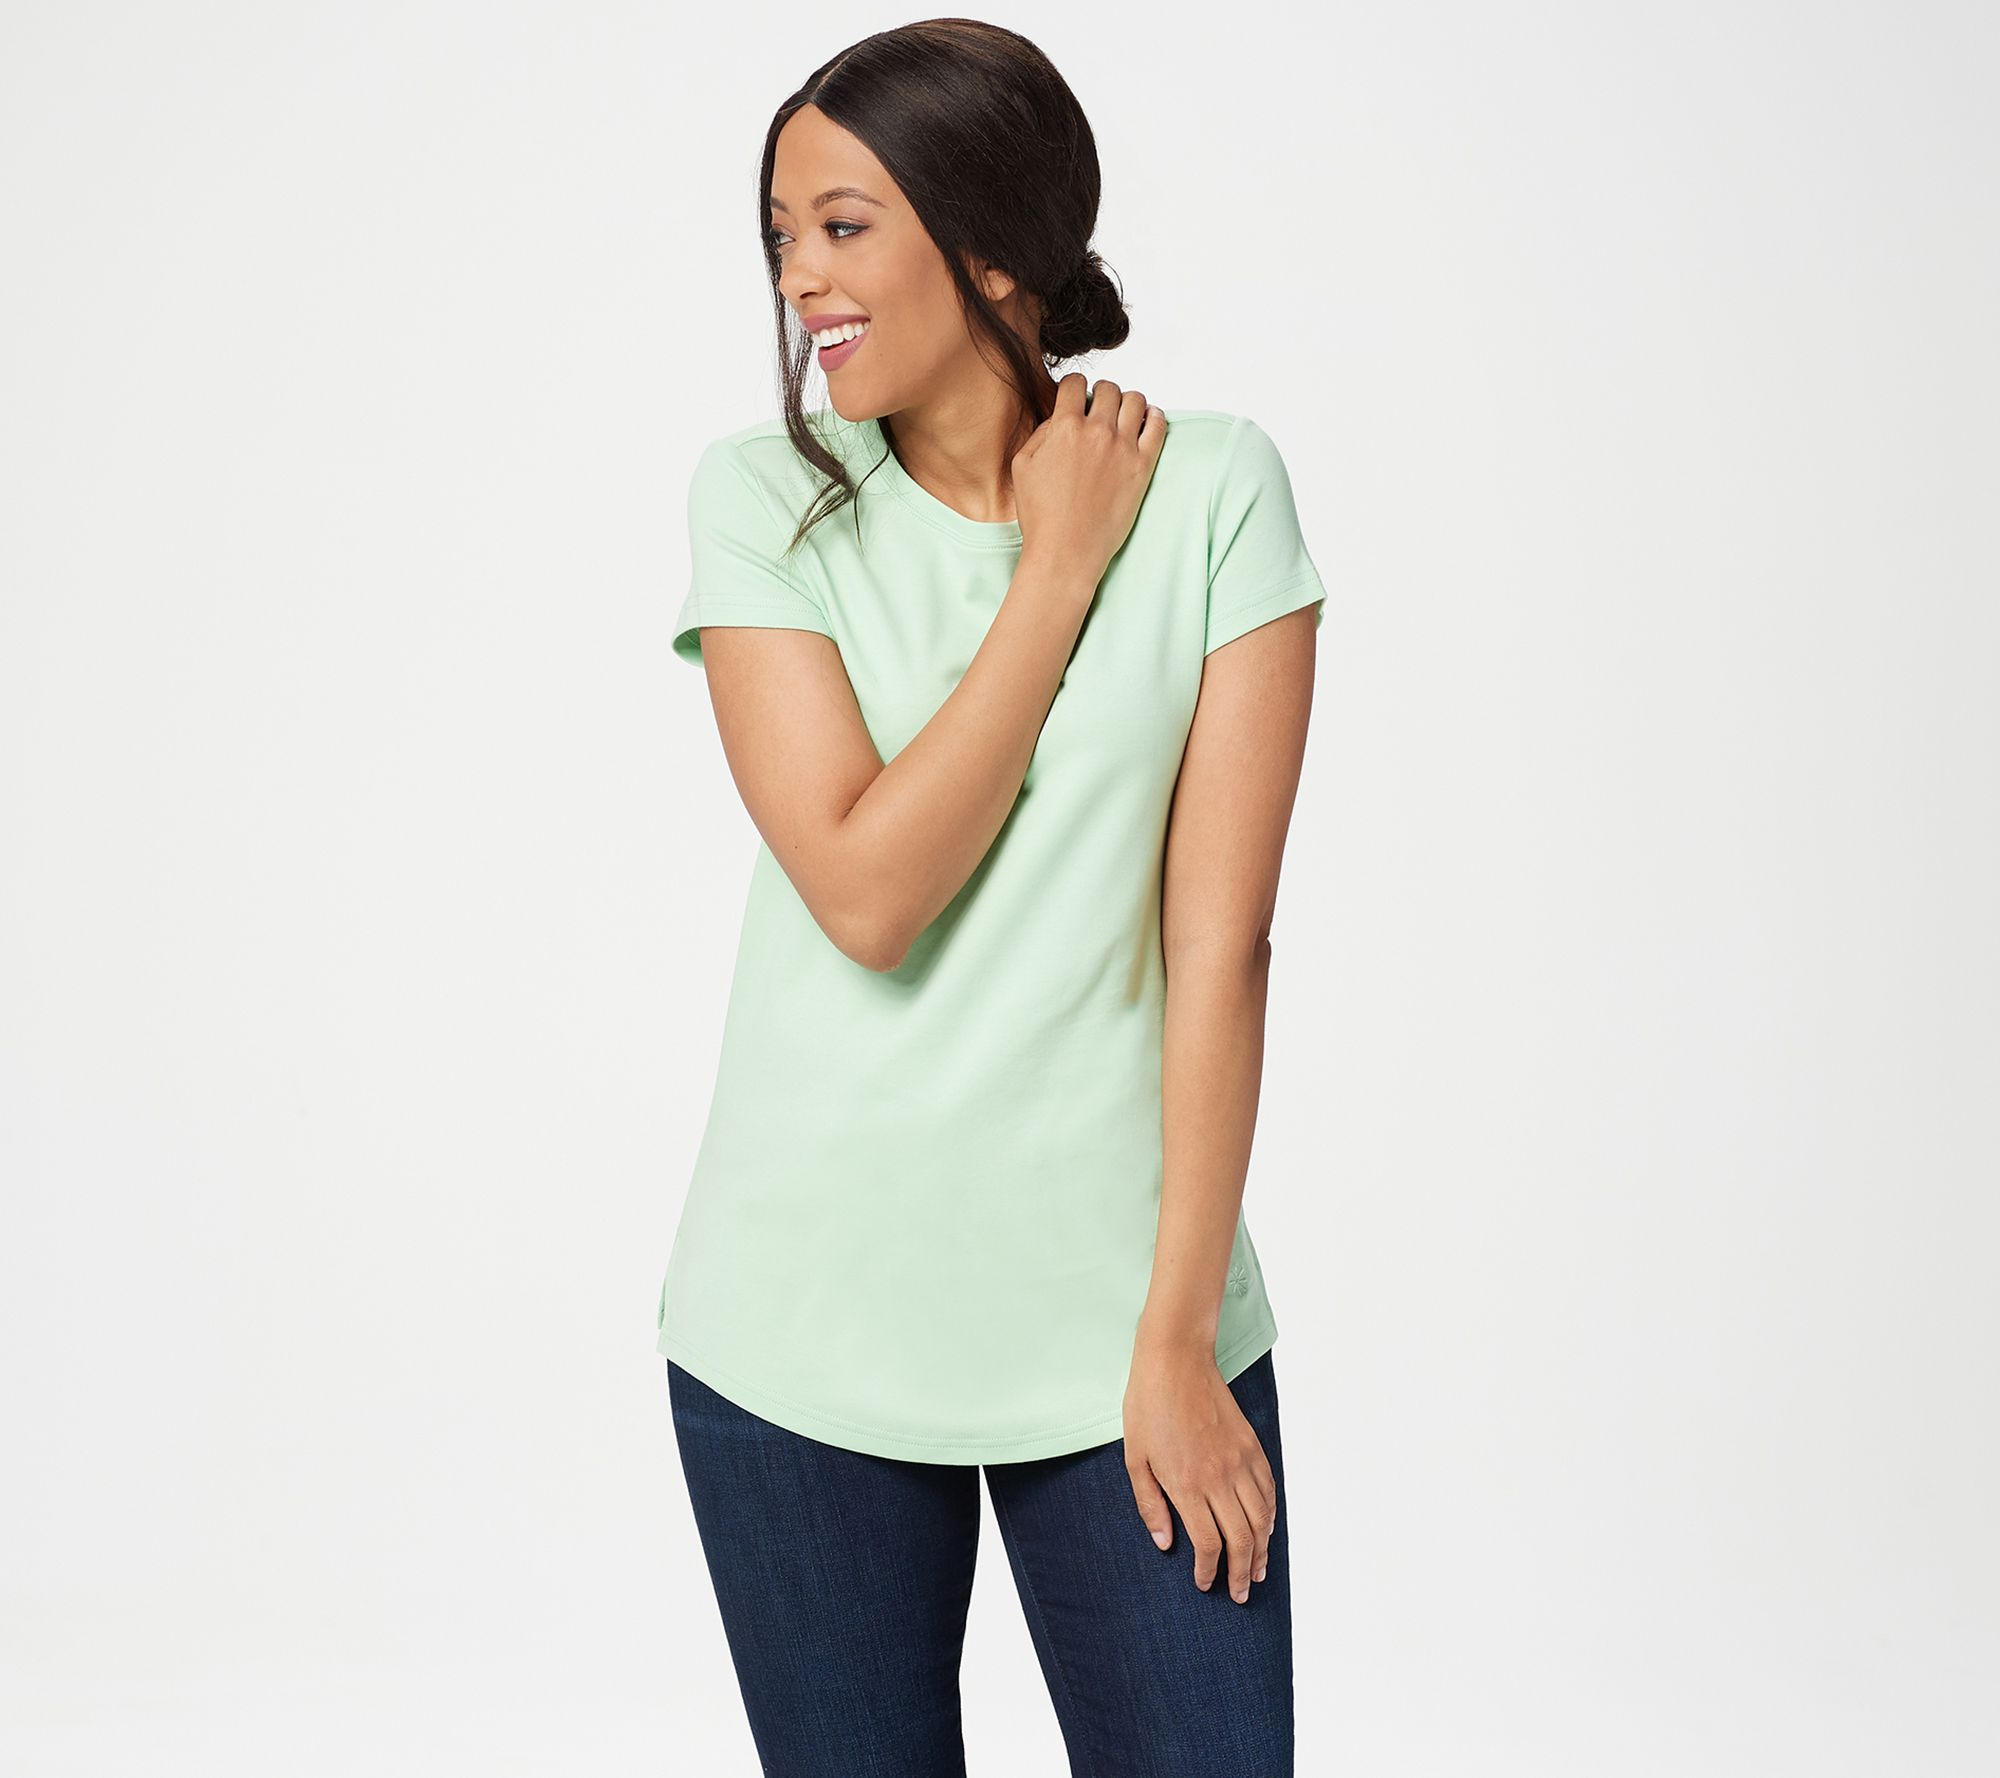 New customer qvc promo code - Isaac Mizrahi Live Essentials Pima Cotton Curved Hem T Shirt A288195